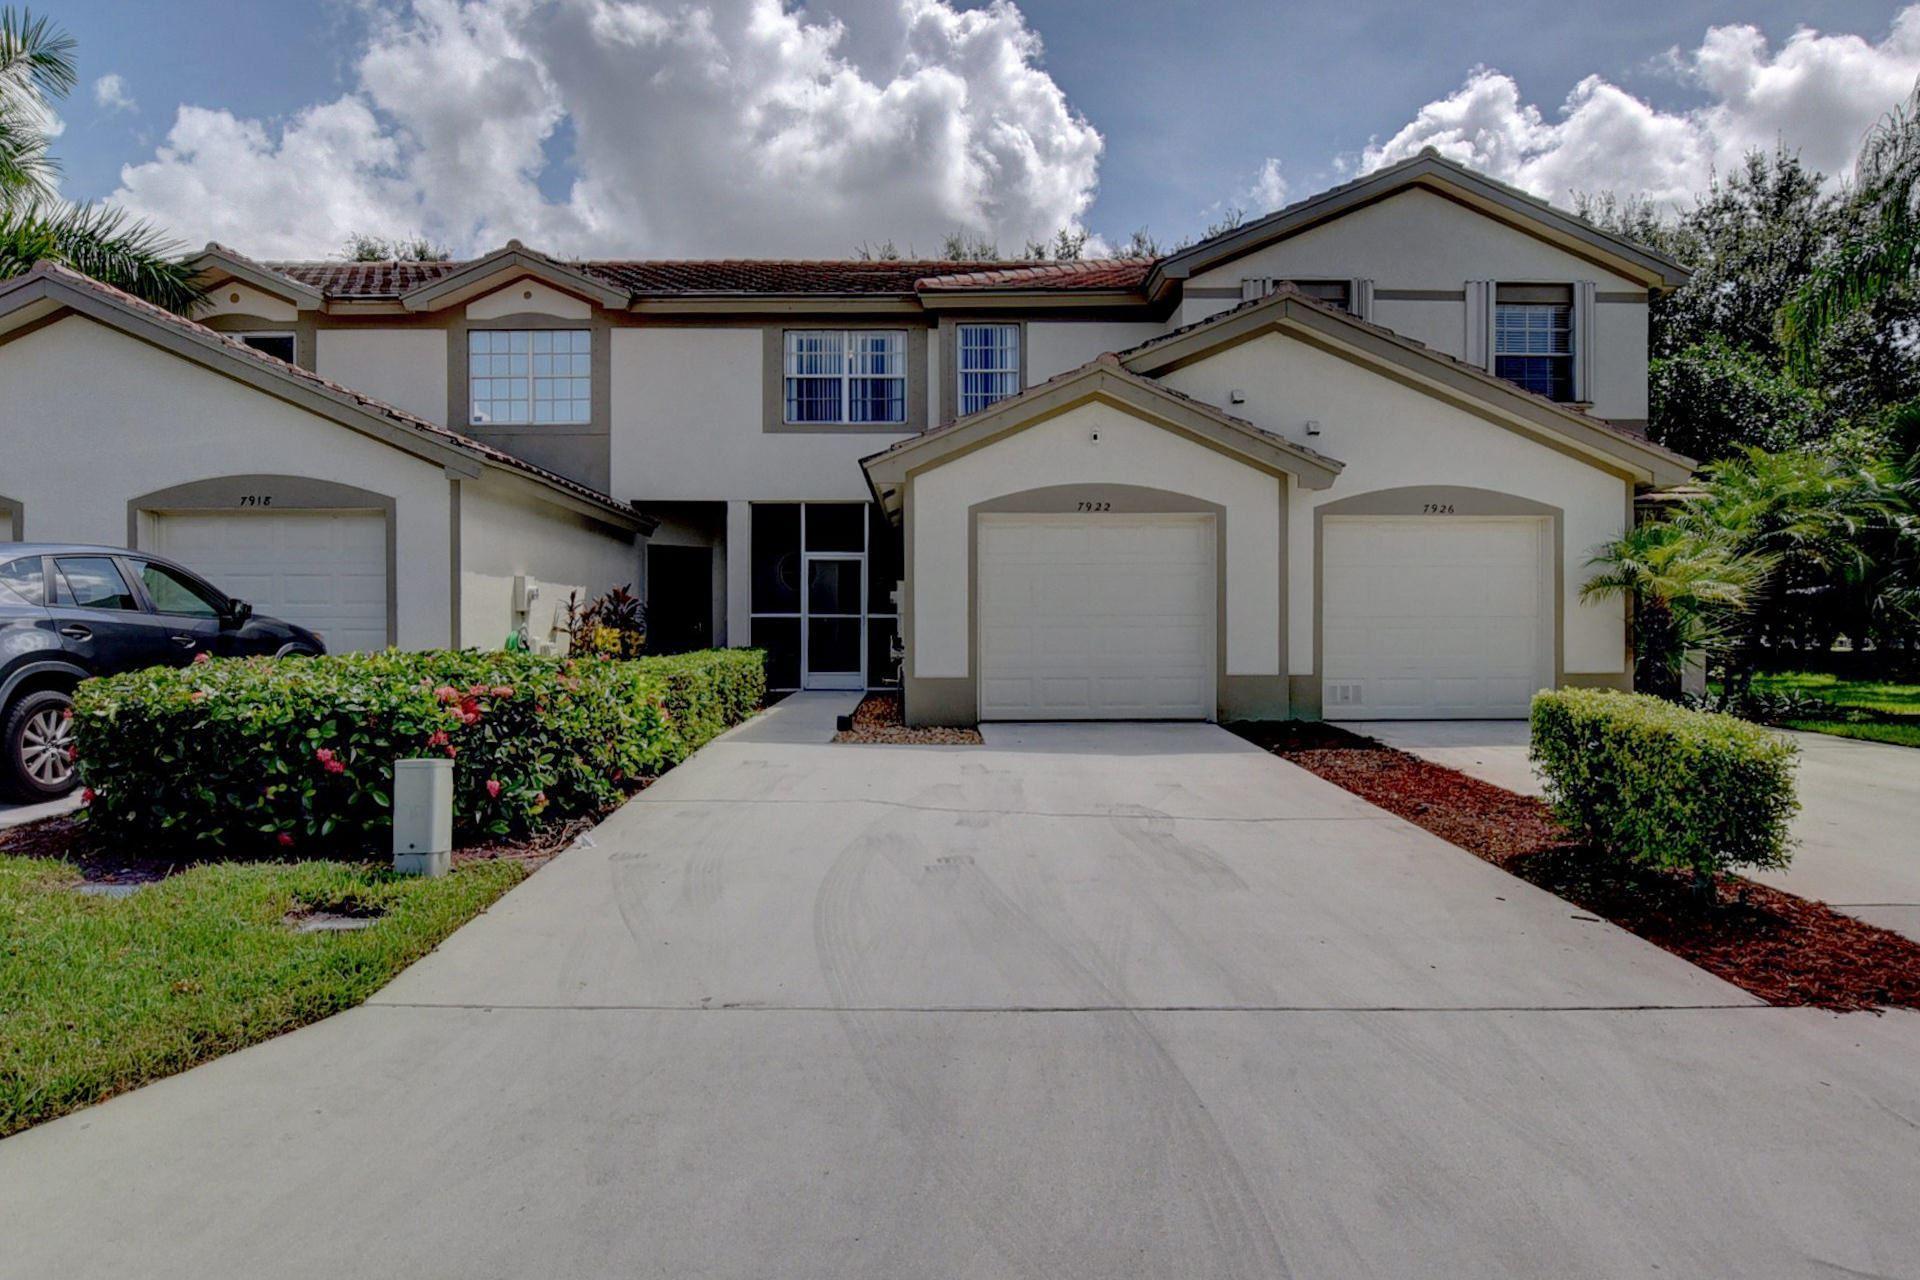 7922 Sienna Springs Drive, Lake Worth, FL 33463 - #: RX-10656490